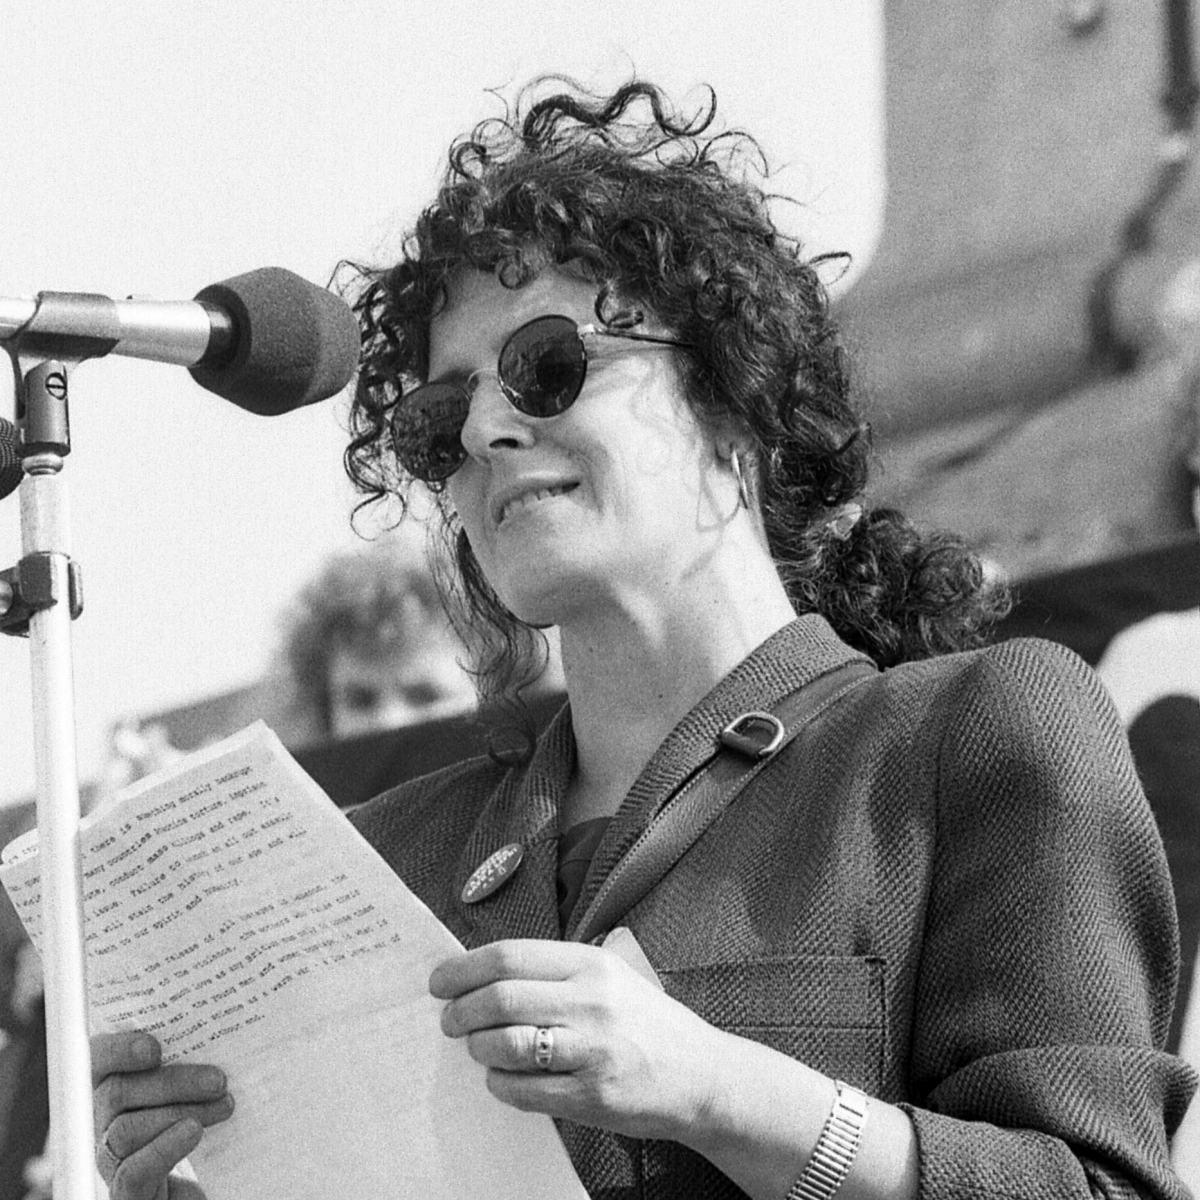 Anita Roddick(1942.10.23-2007.9.10)의 사회적기업가 정신과 바디샵의 임팩트 비즈니스는 불가분의 관계였다. ©David Fowler/Shutterstock